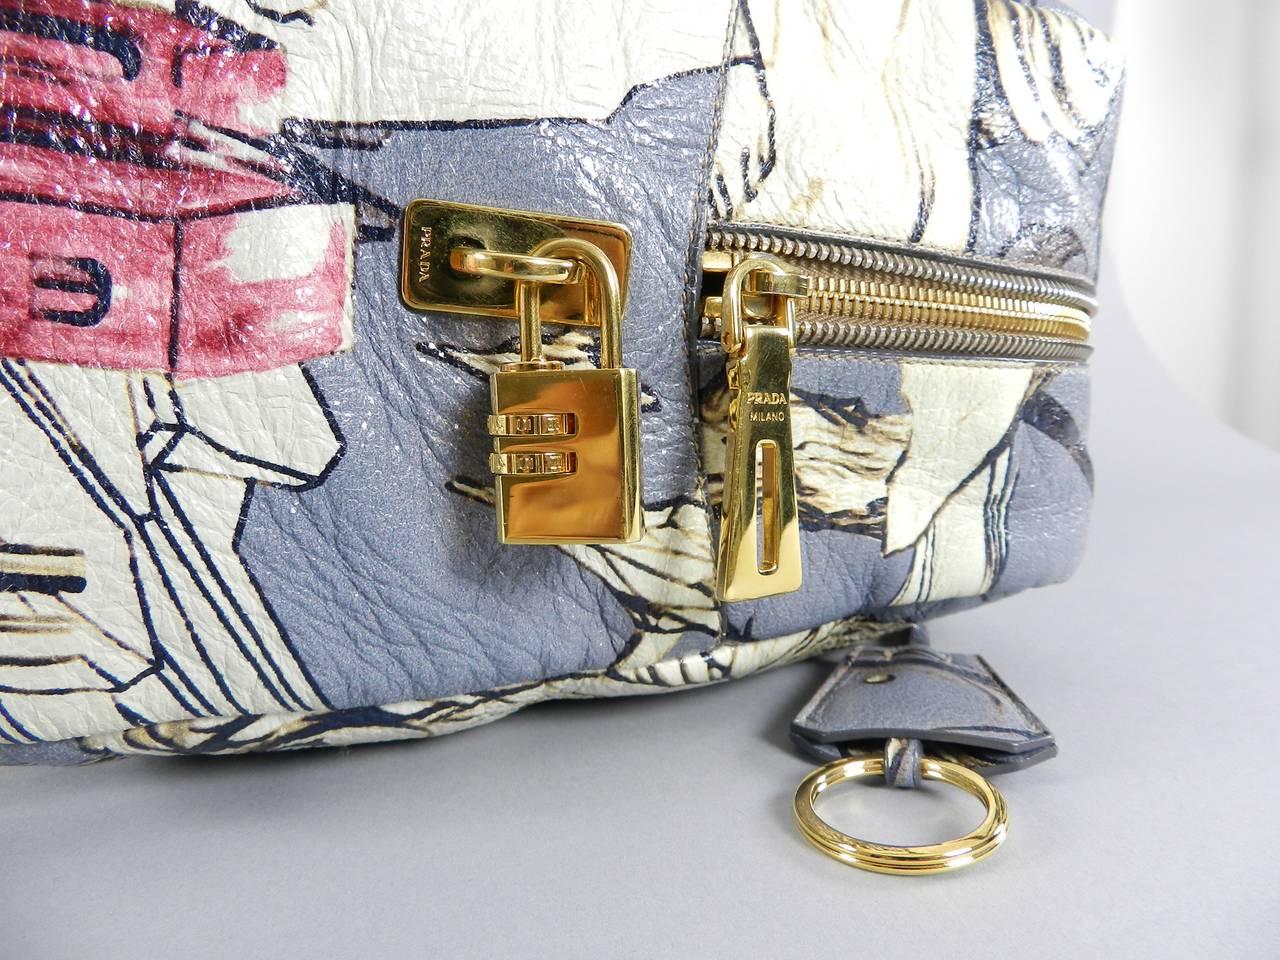 11cf974d4dd7 Prada Fairy Bag - Limitied Edition James Jean For Sale 6